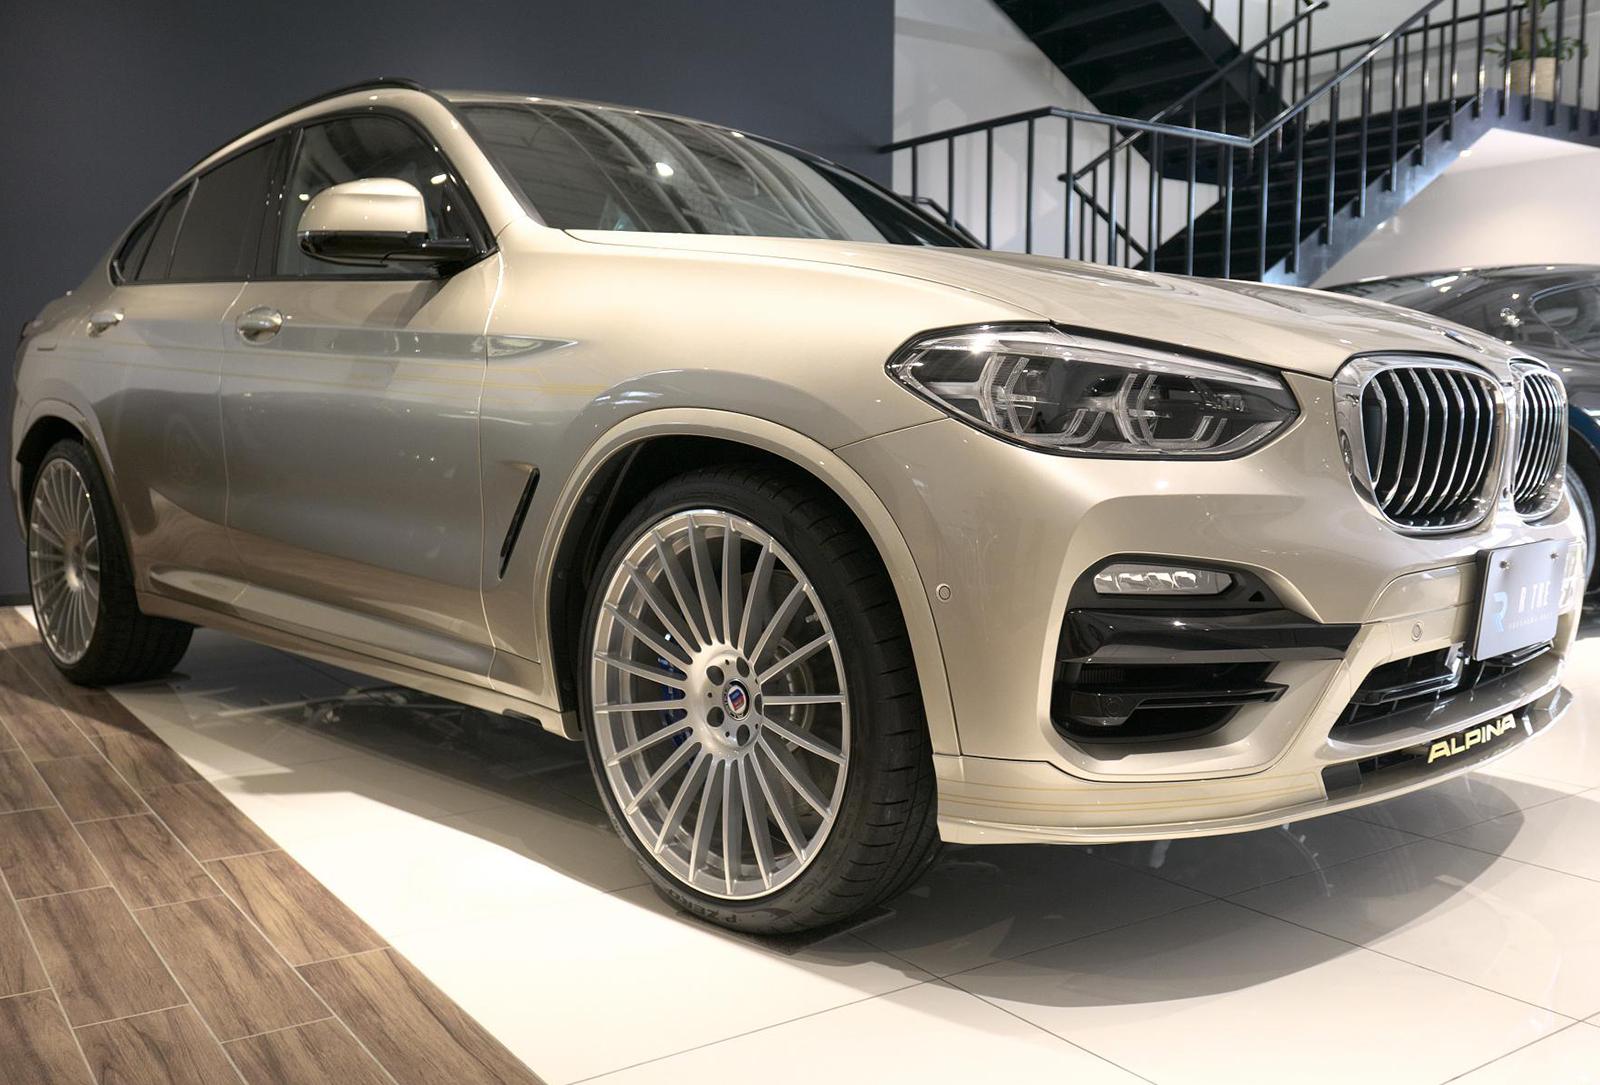 BMW アルピナ XD4 Allrad 右フロント